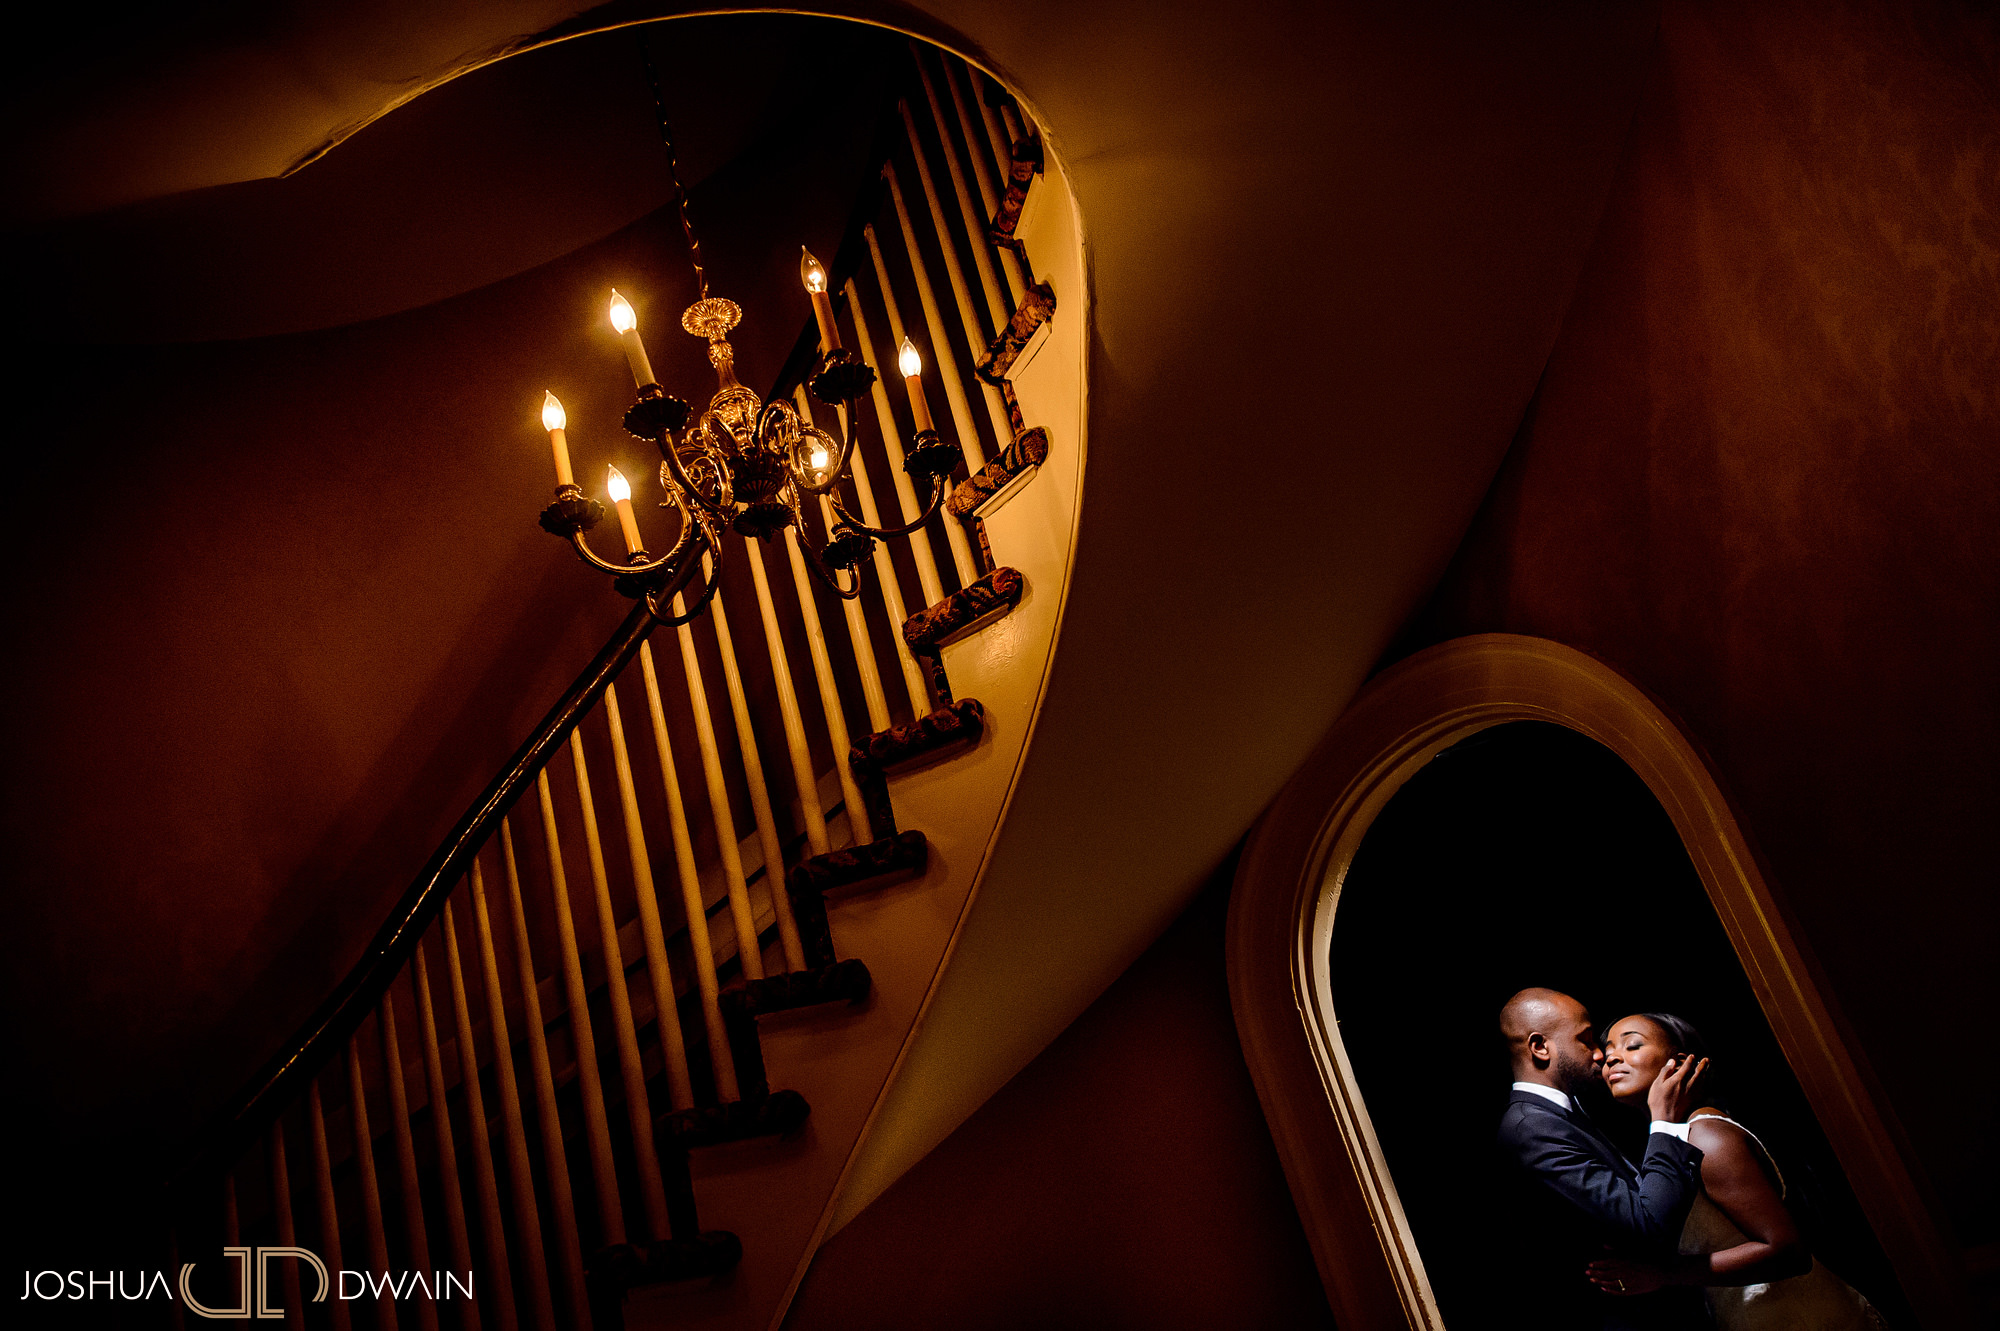 joshua-dwain-weddings-gallery-best-wedding-photographers-us-026